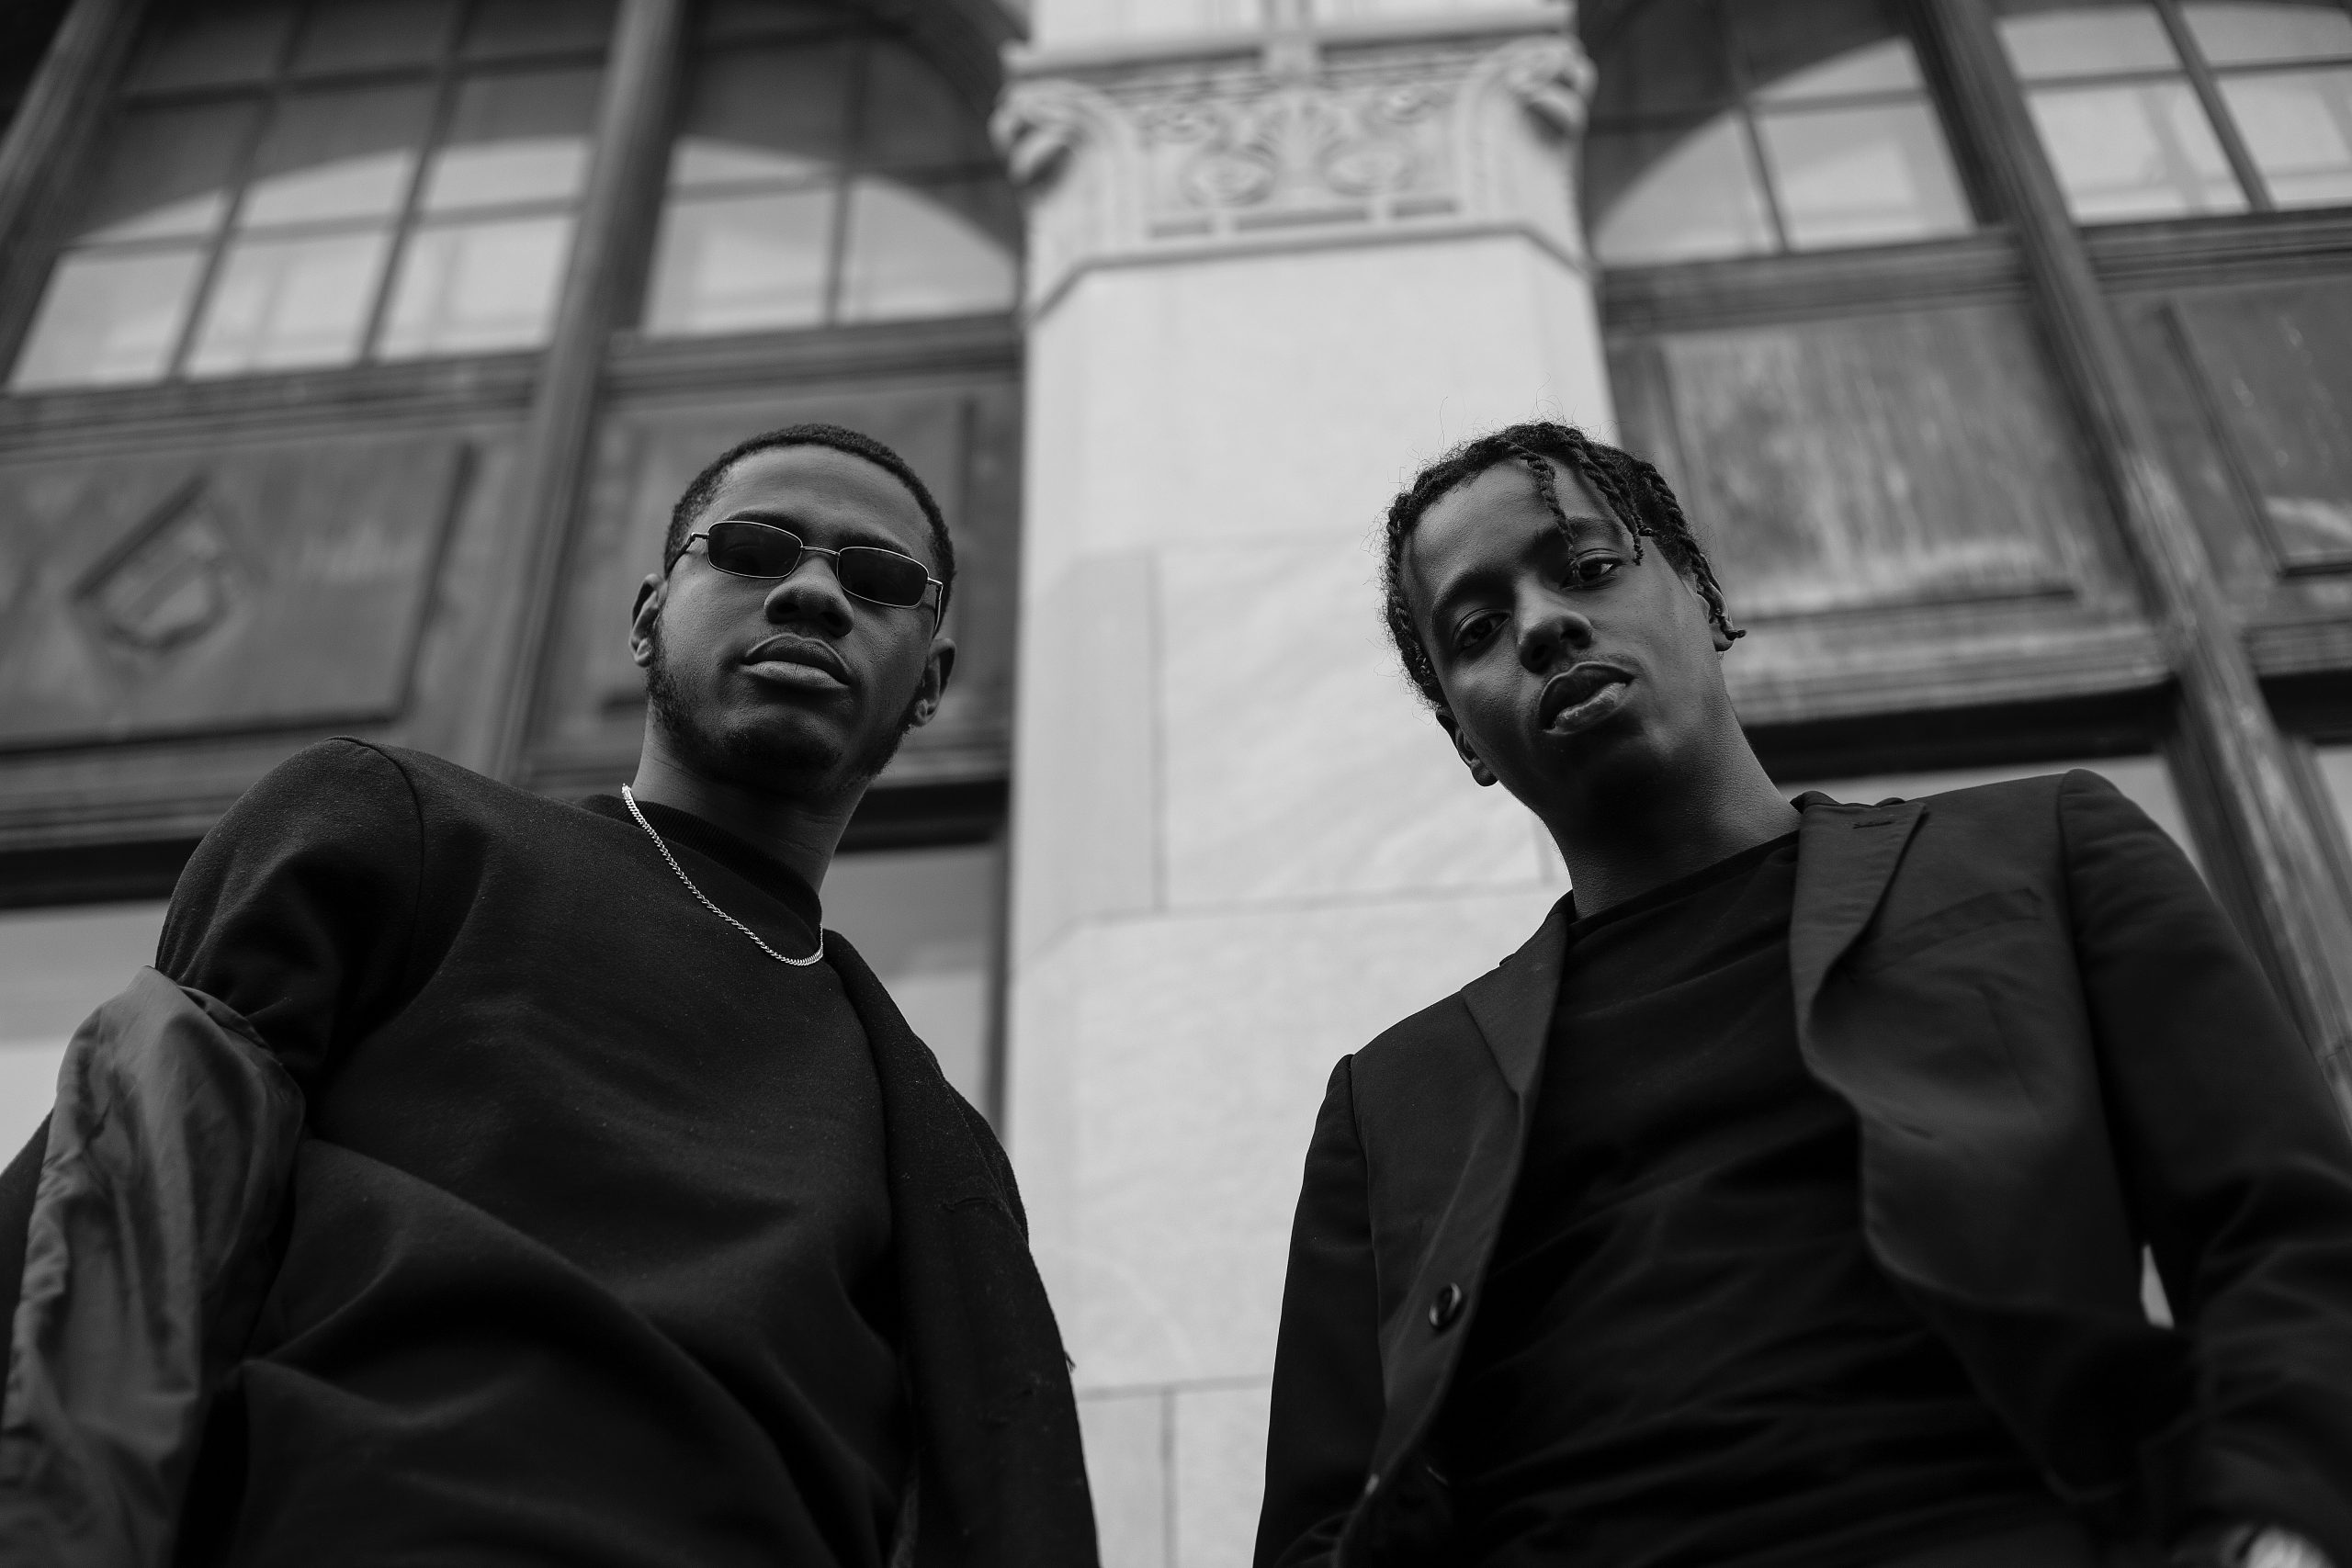 Black Movie Marathon image of two black men